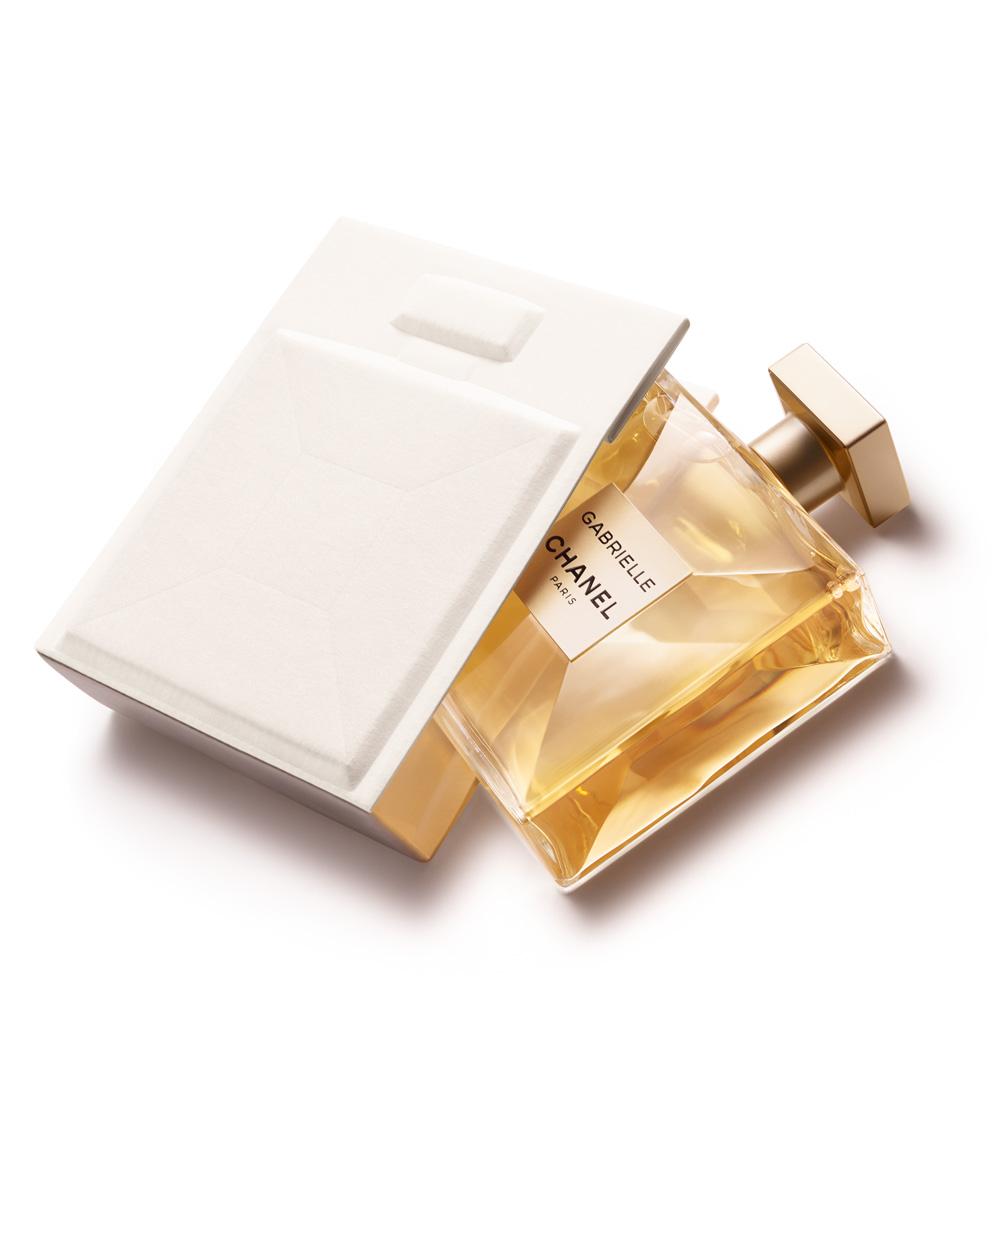 Gabrielle Chanel, Parfum Terbaru dari Chanel